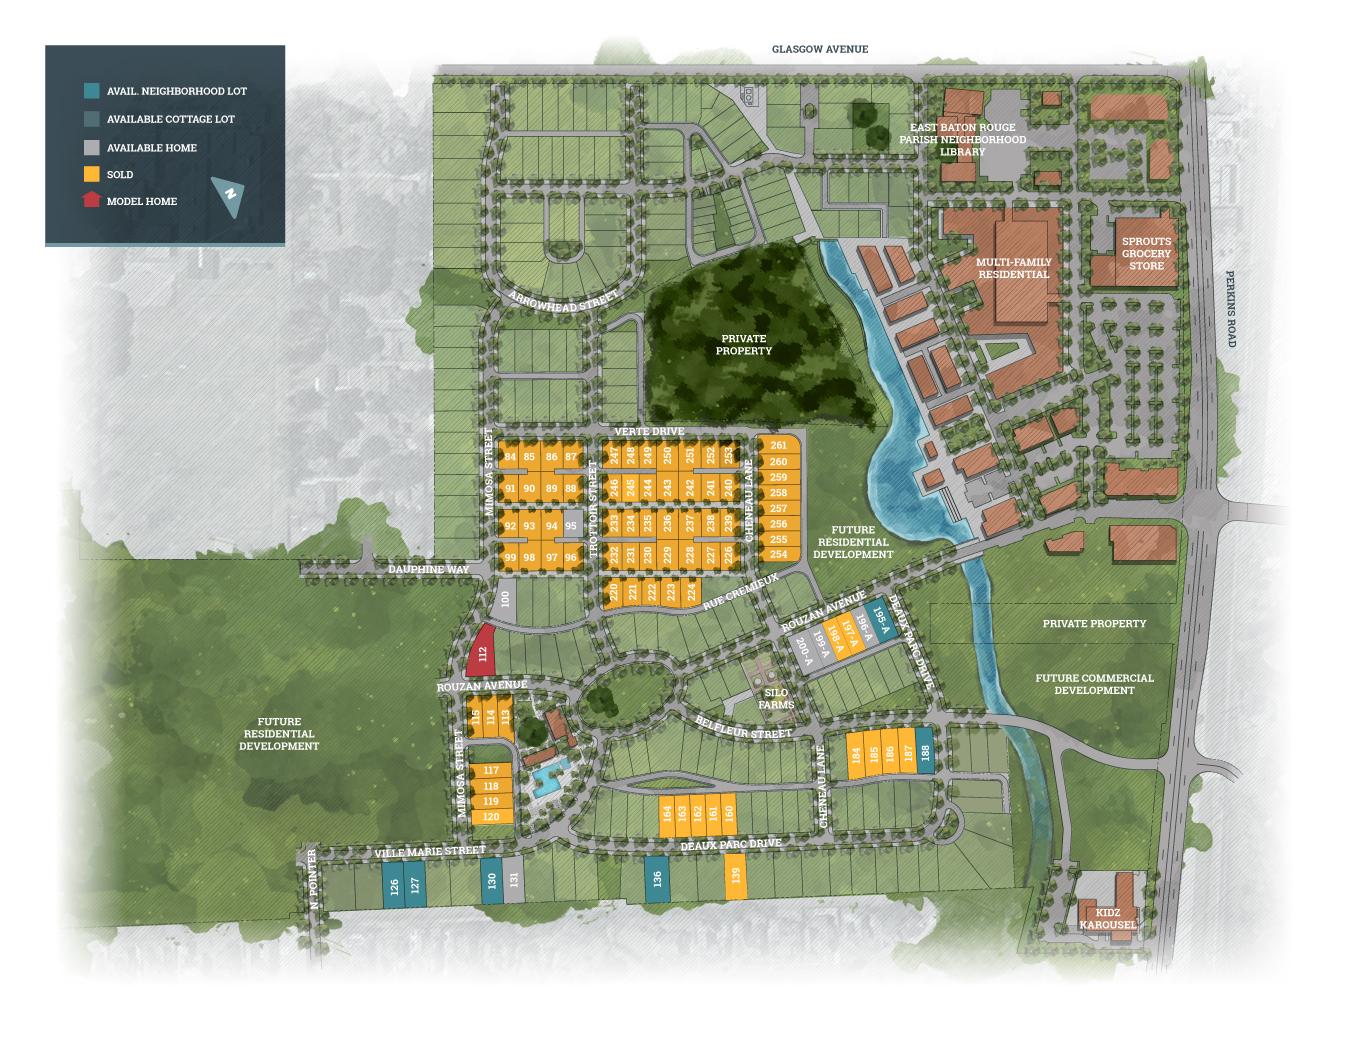 Baton Rouge, LA Rouzan New Homes from Level Homes